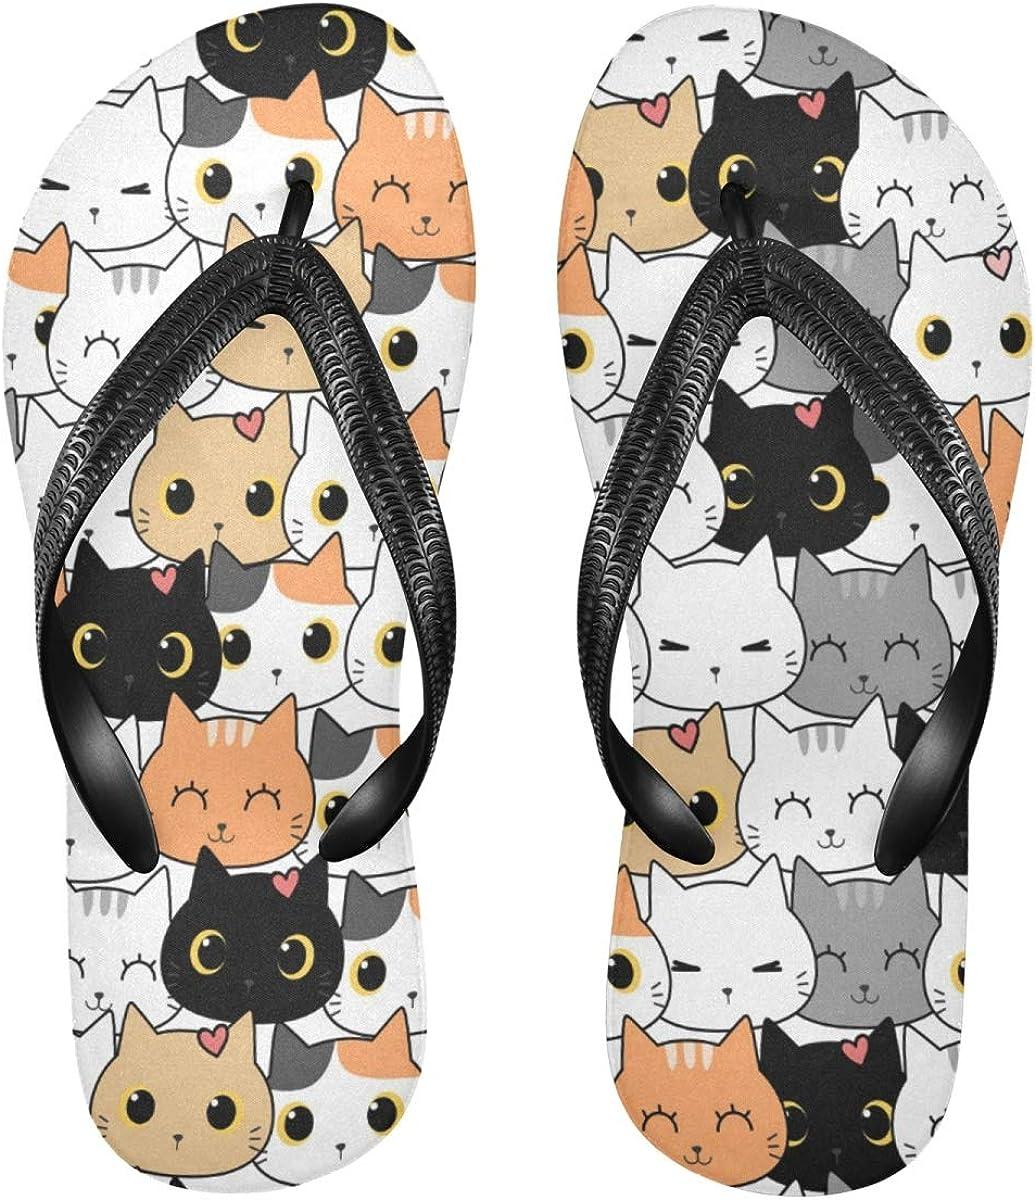 Women's Flip Flop Sandals for Teen Boys Men Girls - Cute Cat Kitten Cartoon Color Printing Waterproof Outdoor Summer Beach Slippers Beachwear S